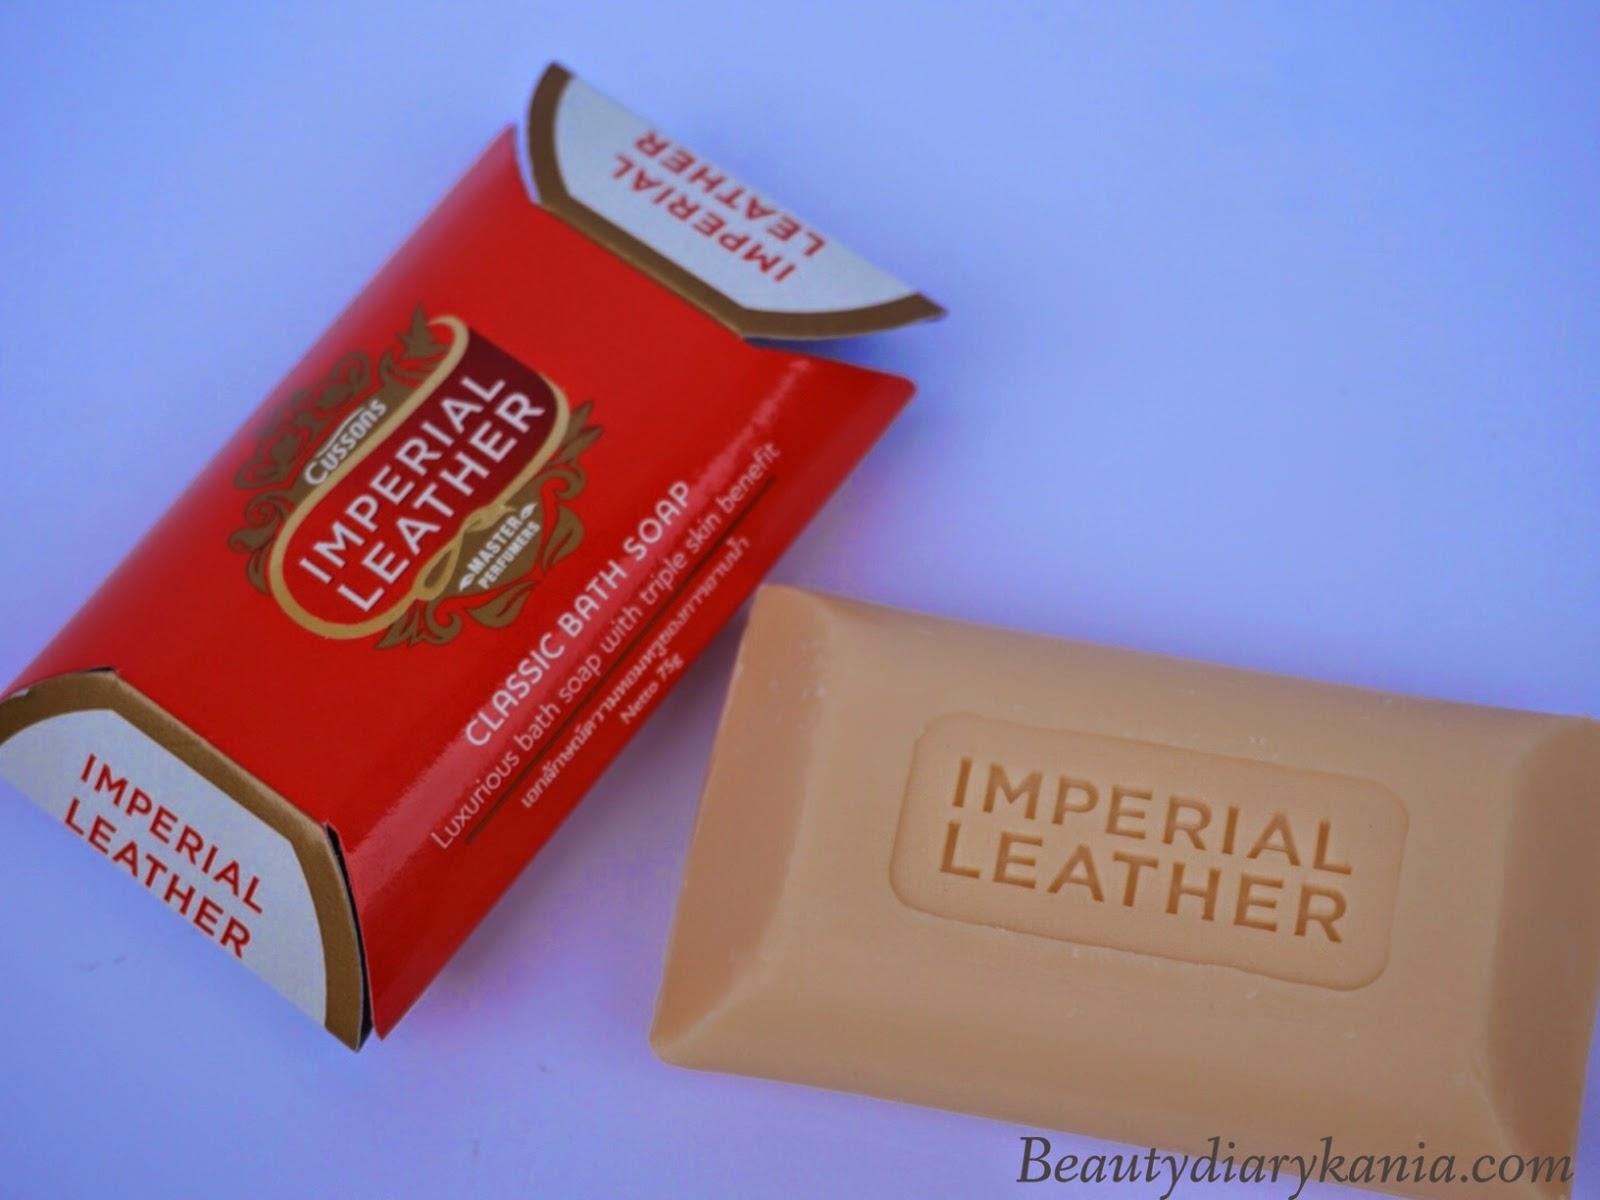 Beauty Diary Kania Review Cussons Imperial Leather Bar Soap Classic Body Kemasan Dikemas Menggunakan Hard Paper Yang Diberikan Label Bewarna Merah Dilengkapi Dengan Plastik Bening Didalamnya